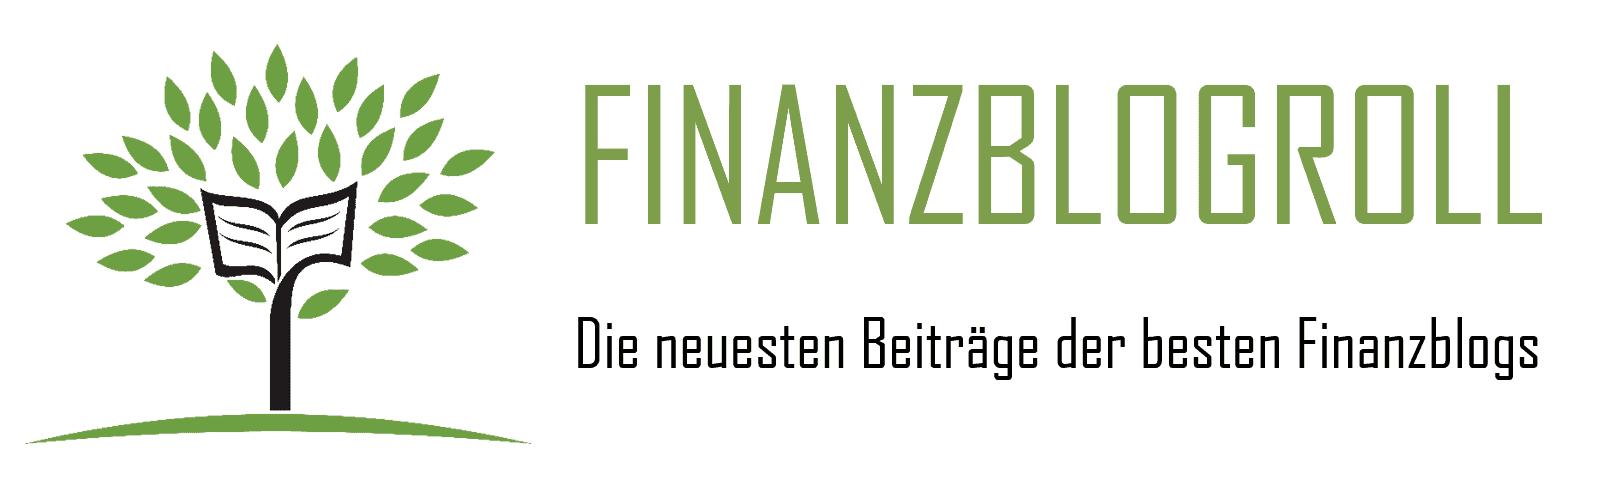 Finanzblogroll_Logo_neu